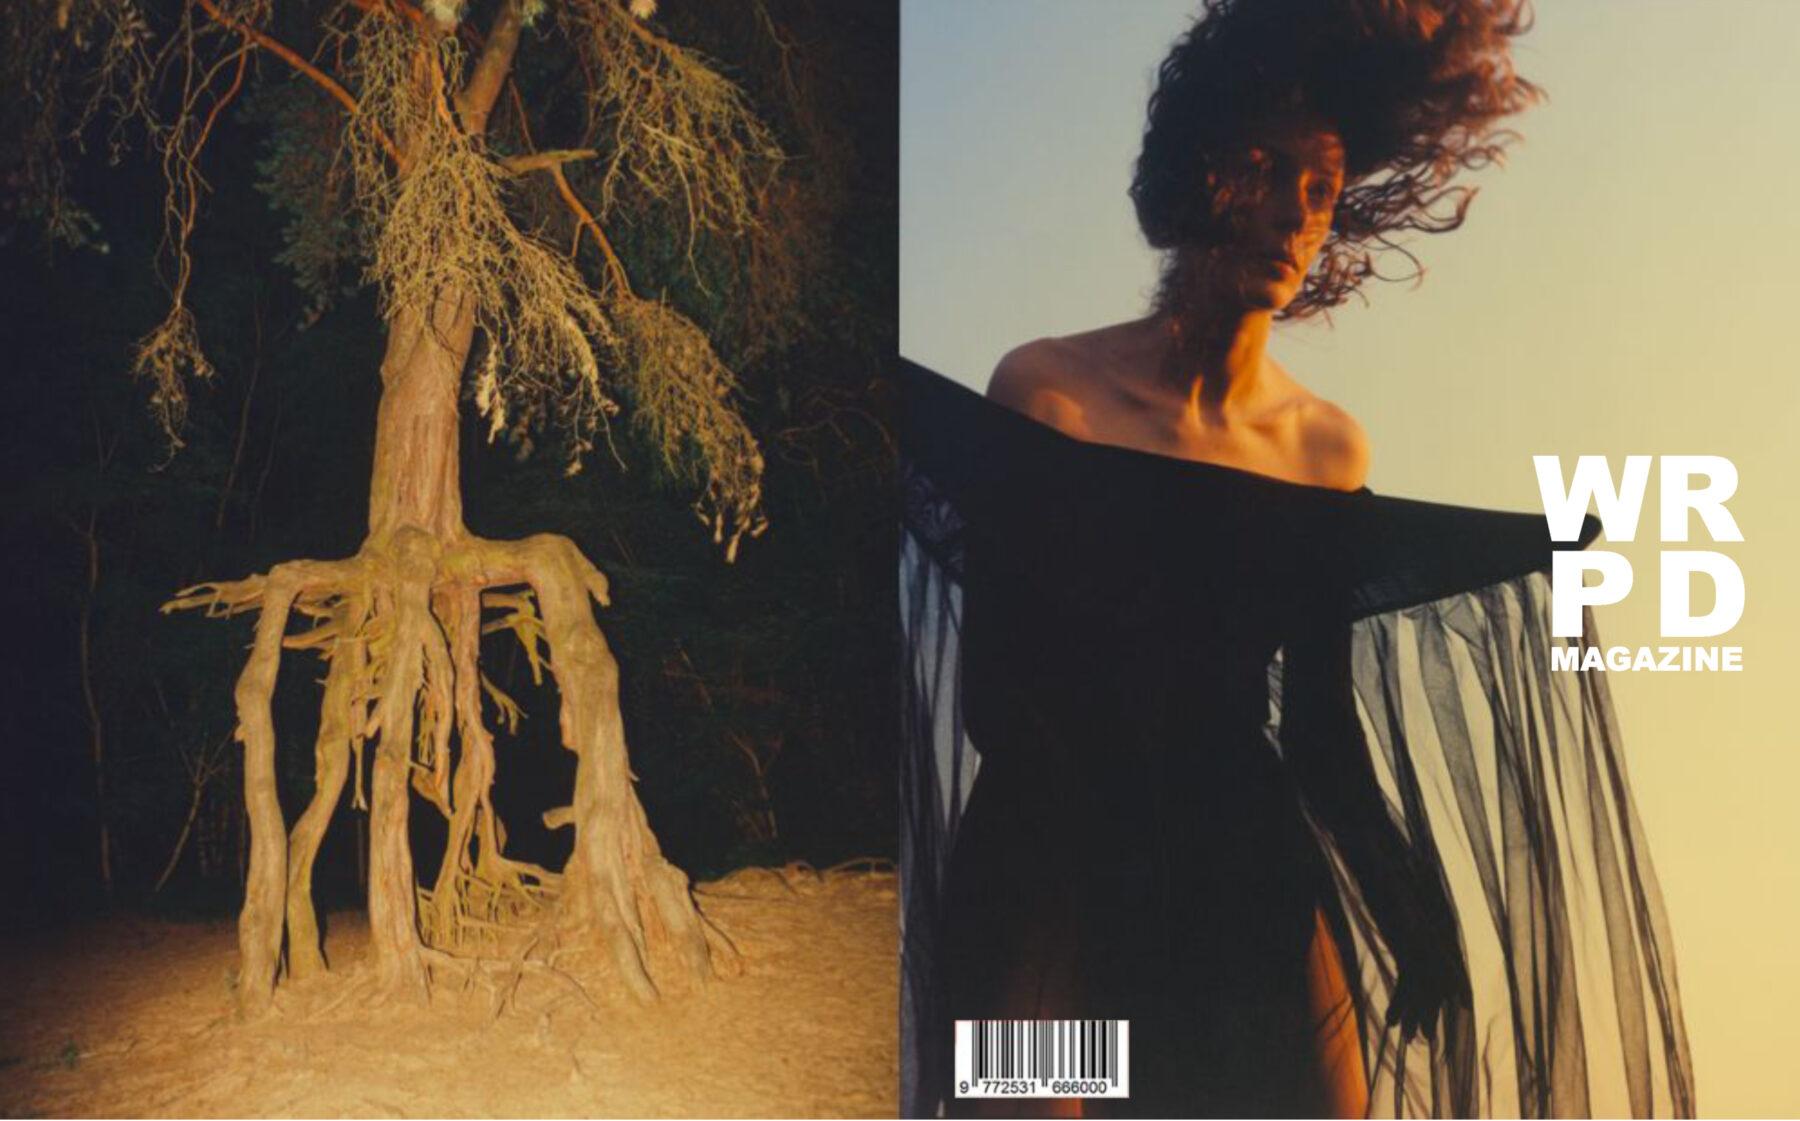 Fashion story for WRPD Magazine with makeup by Kama Jankowska